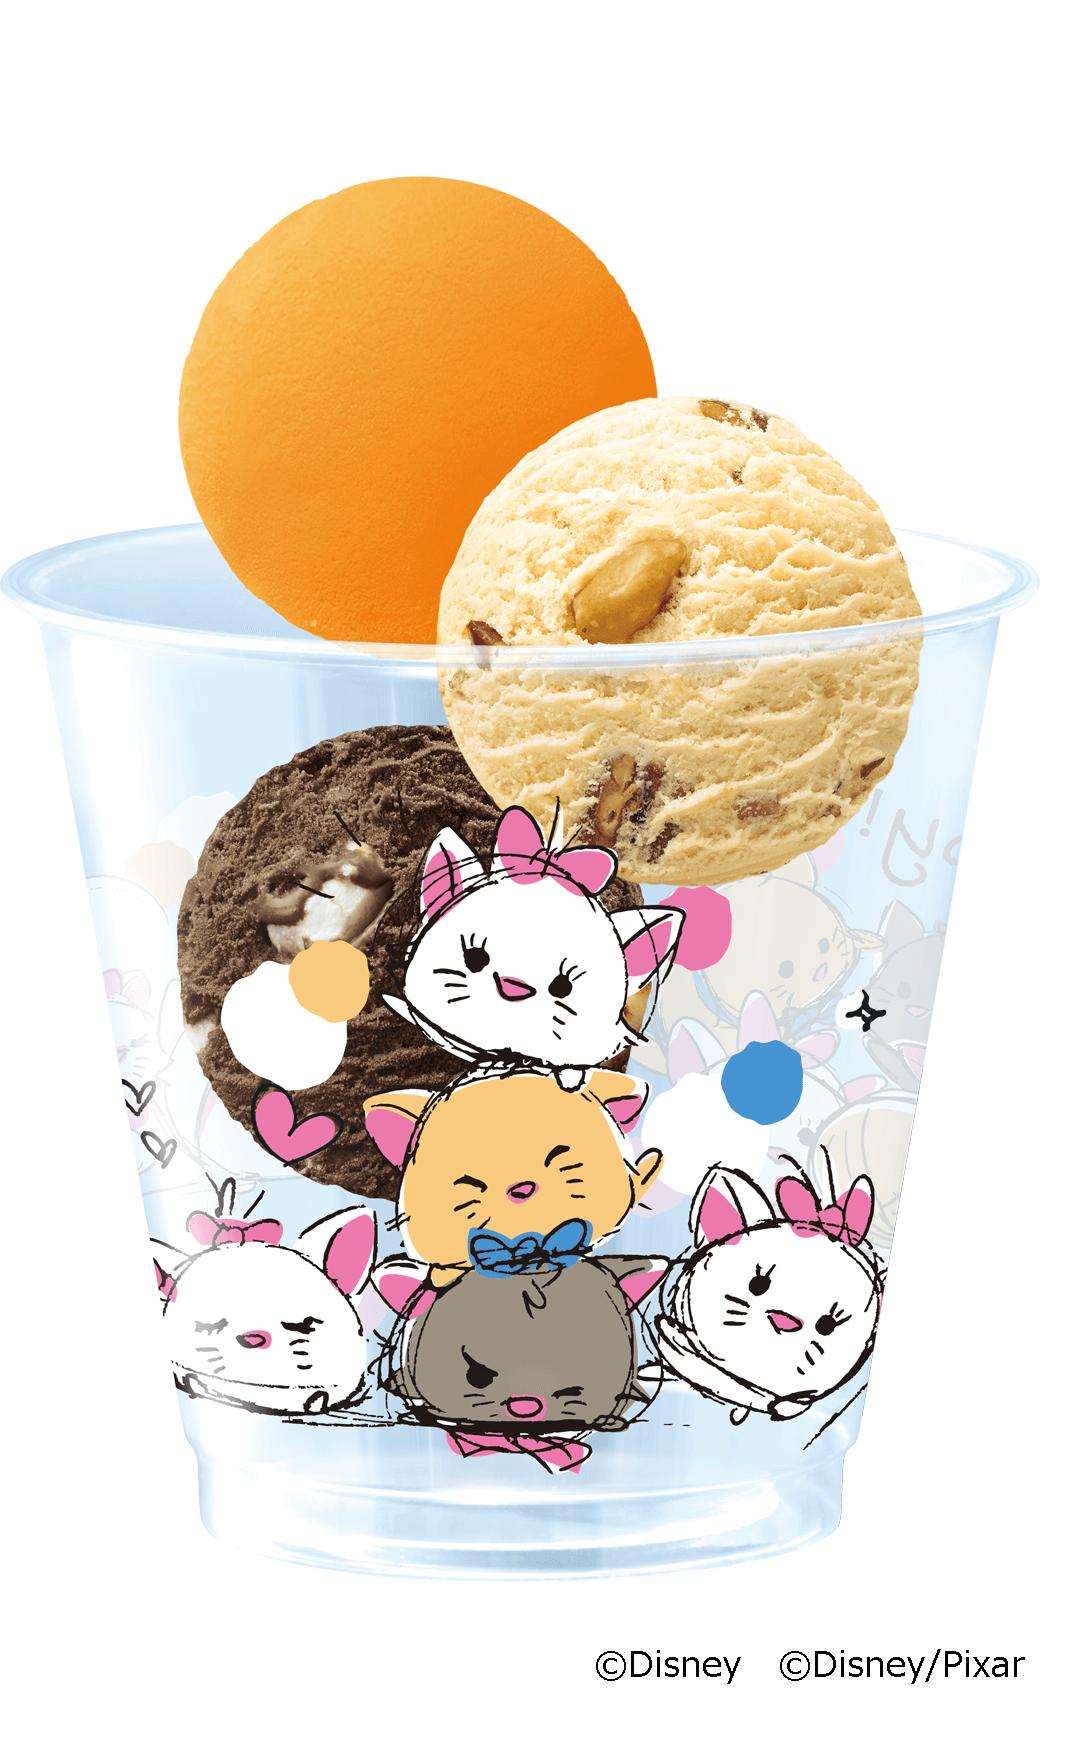 b%e2%80%90r-%e3%82%b5%e3%83%bc%e3%83%86%e3%82%a3%e3%83%af%e3%83%b3-%e3%82%a2%e3%82%a4%e3%82%b9%e3%82%af%e3%83%aa%e3%83%bc%e3%83%a0-br-31-ice-cream-%e3%80%8ctsum-tsum-%e3%83%88-4